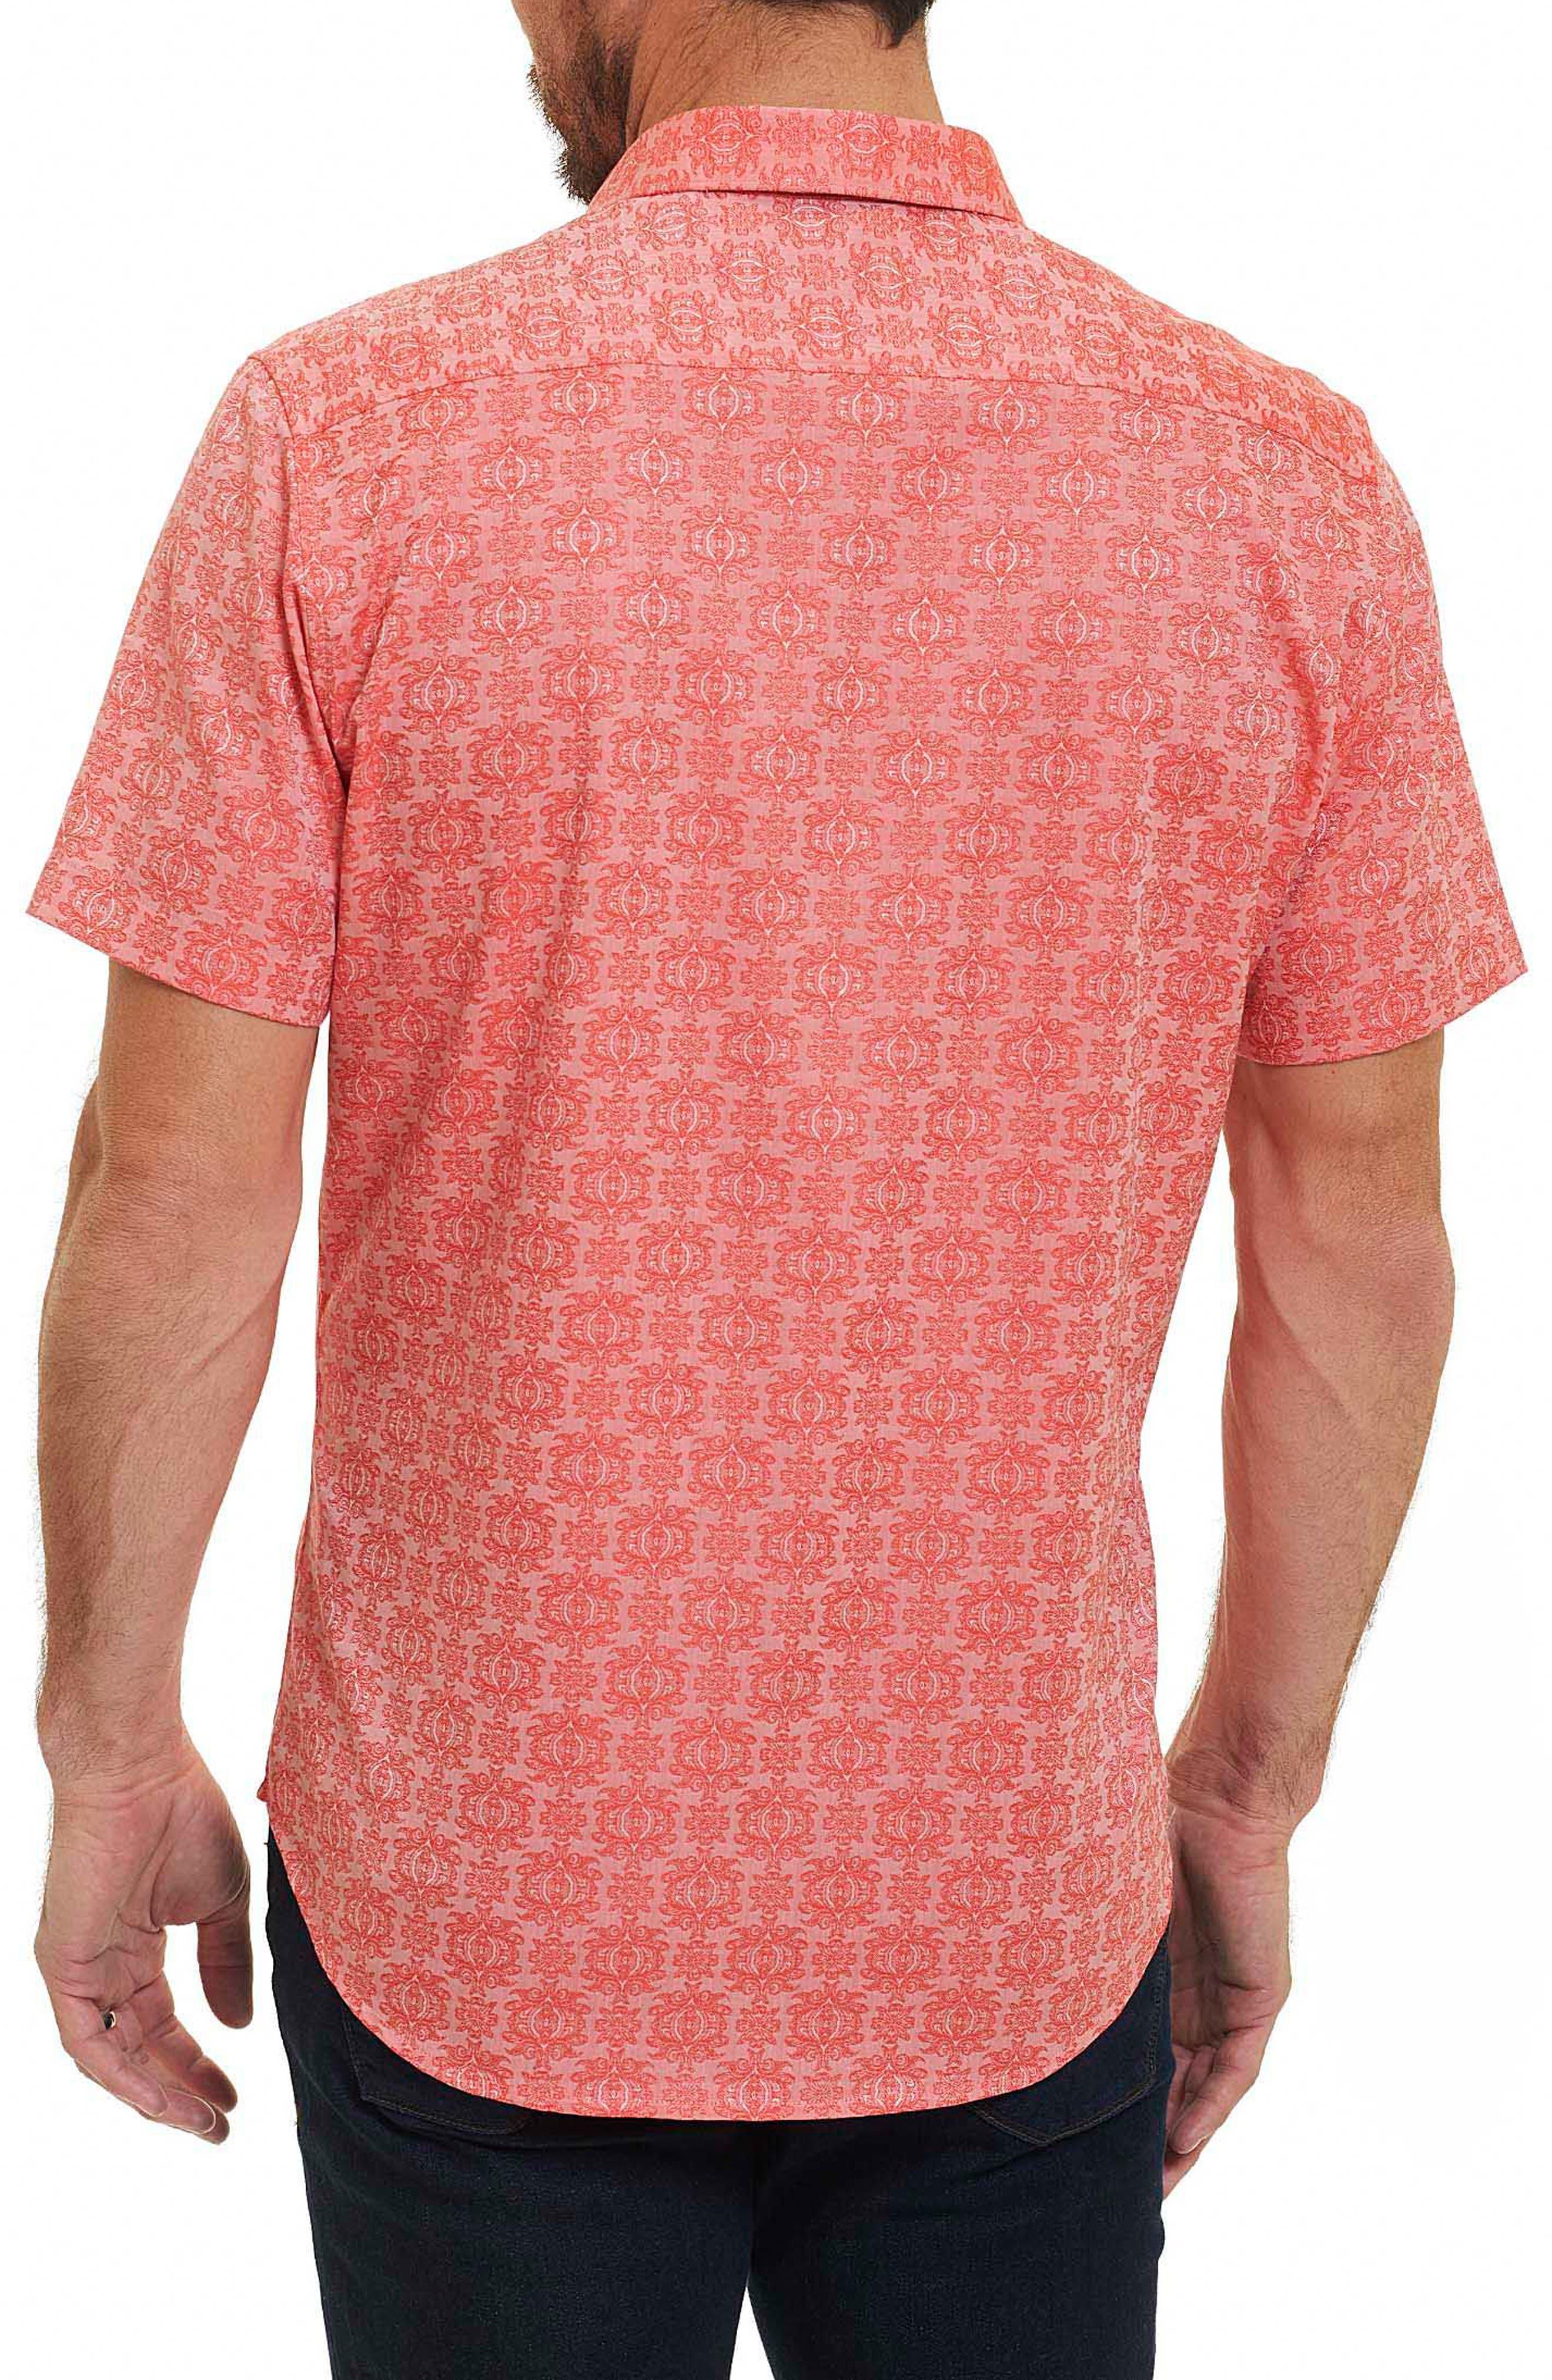 Cullen Regular Fit Sport Shirt,                             Alternate thumbnail 14, color,